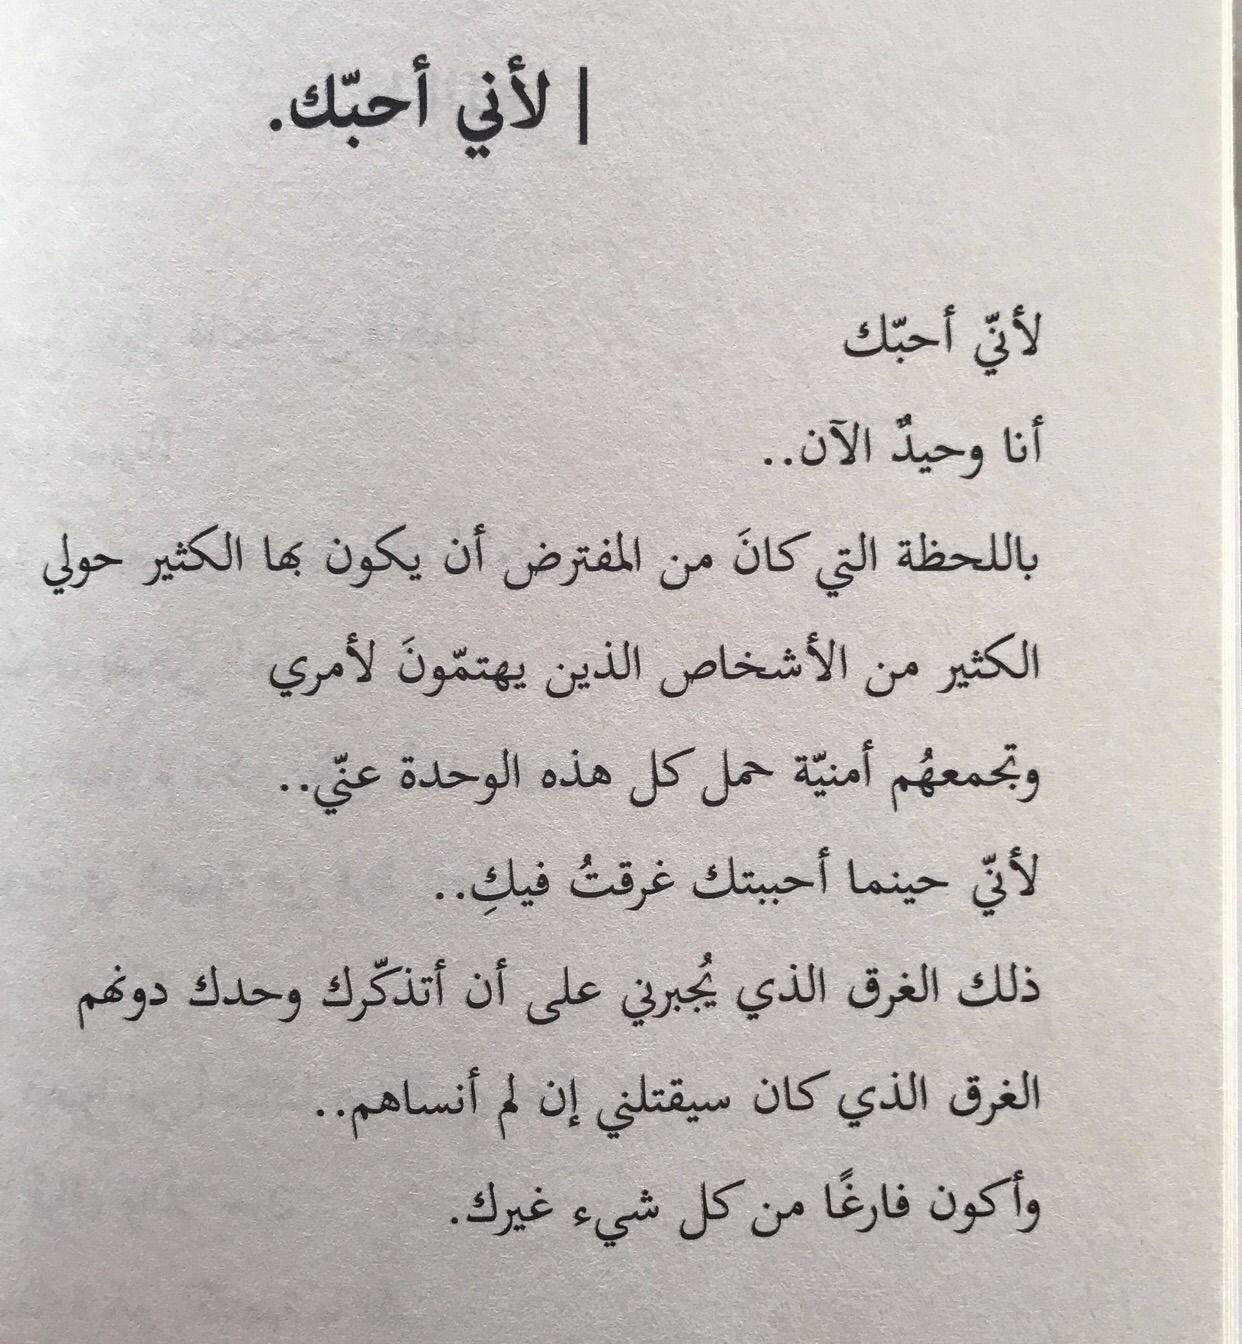 كتاب قبيلة نساء خالد الزايدي Appreciation Quotes One Word Quotes Arabic Quotes